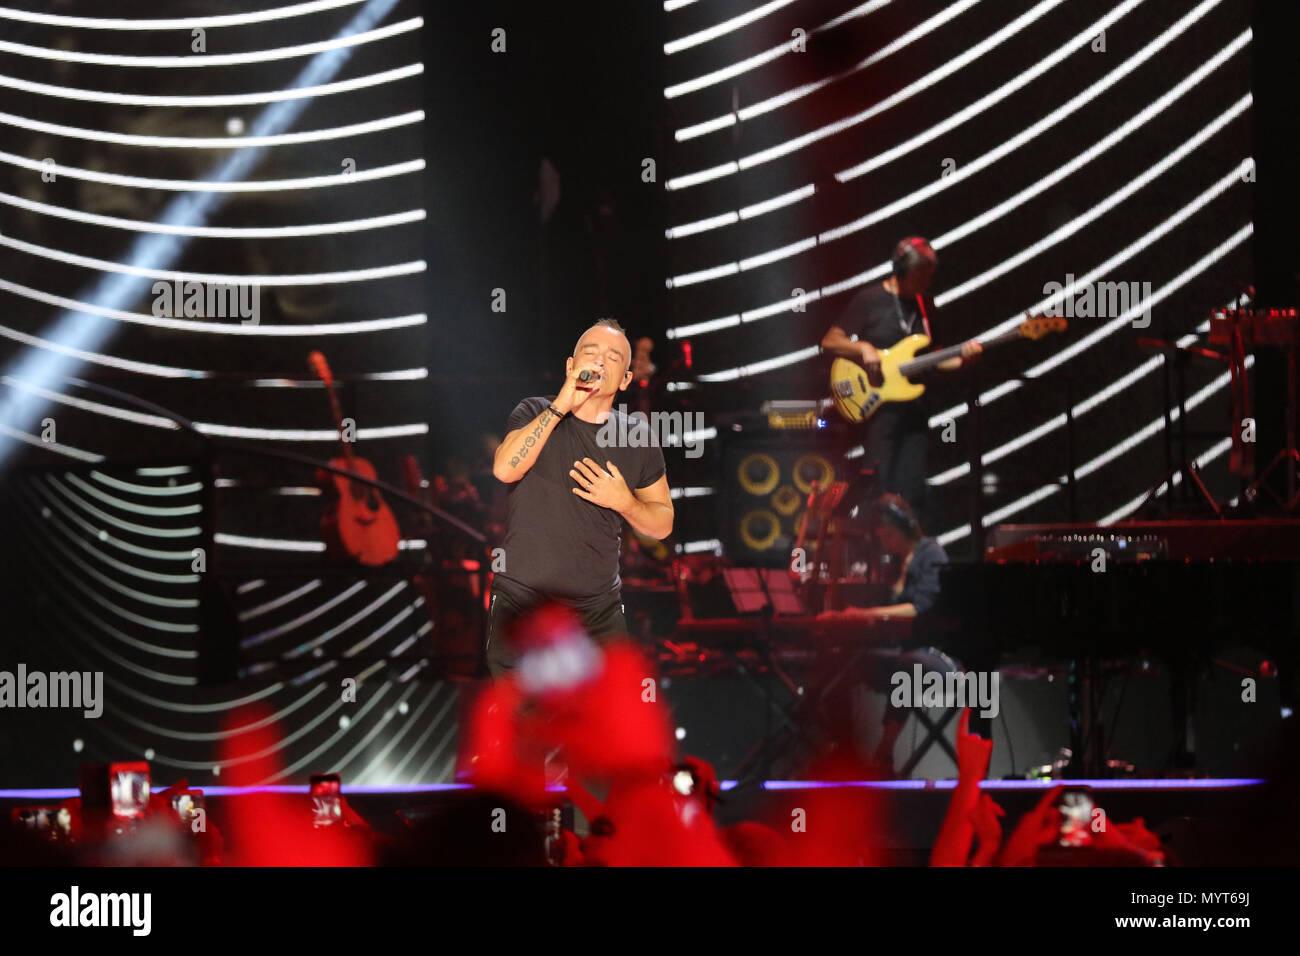 June 7, 2018 - In Photo the singer: Eros Ramazzotti.Naples, Italy